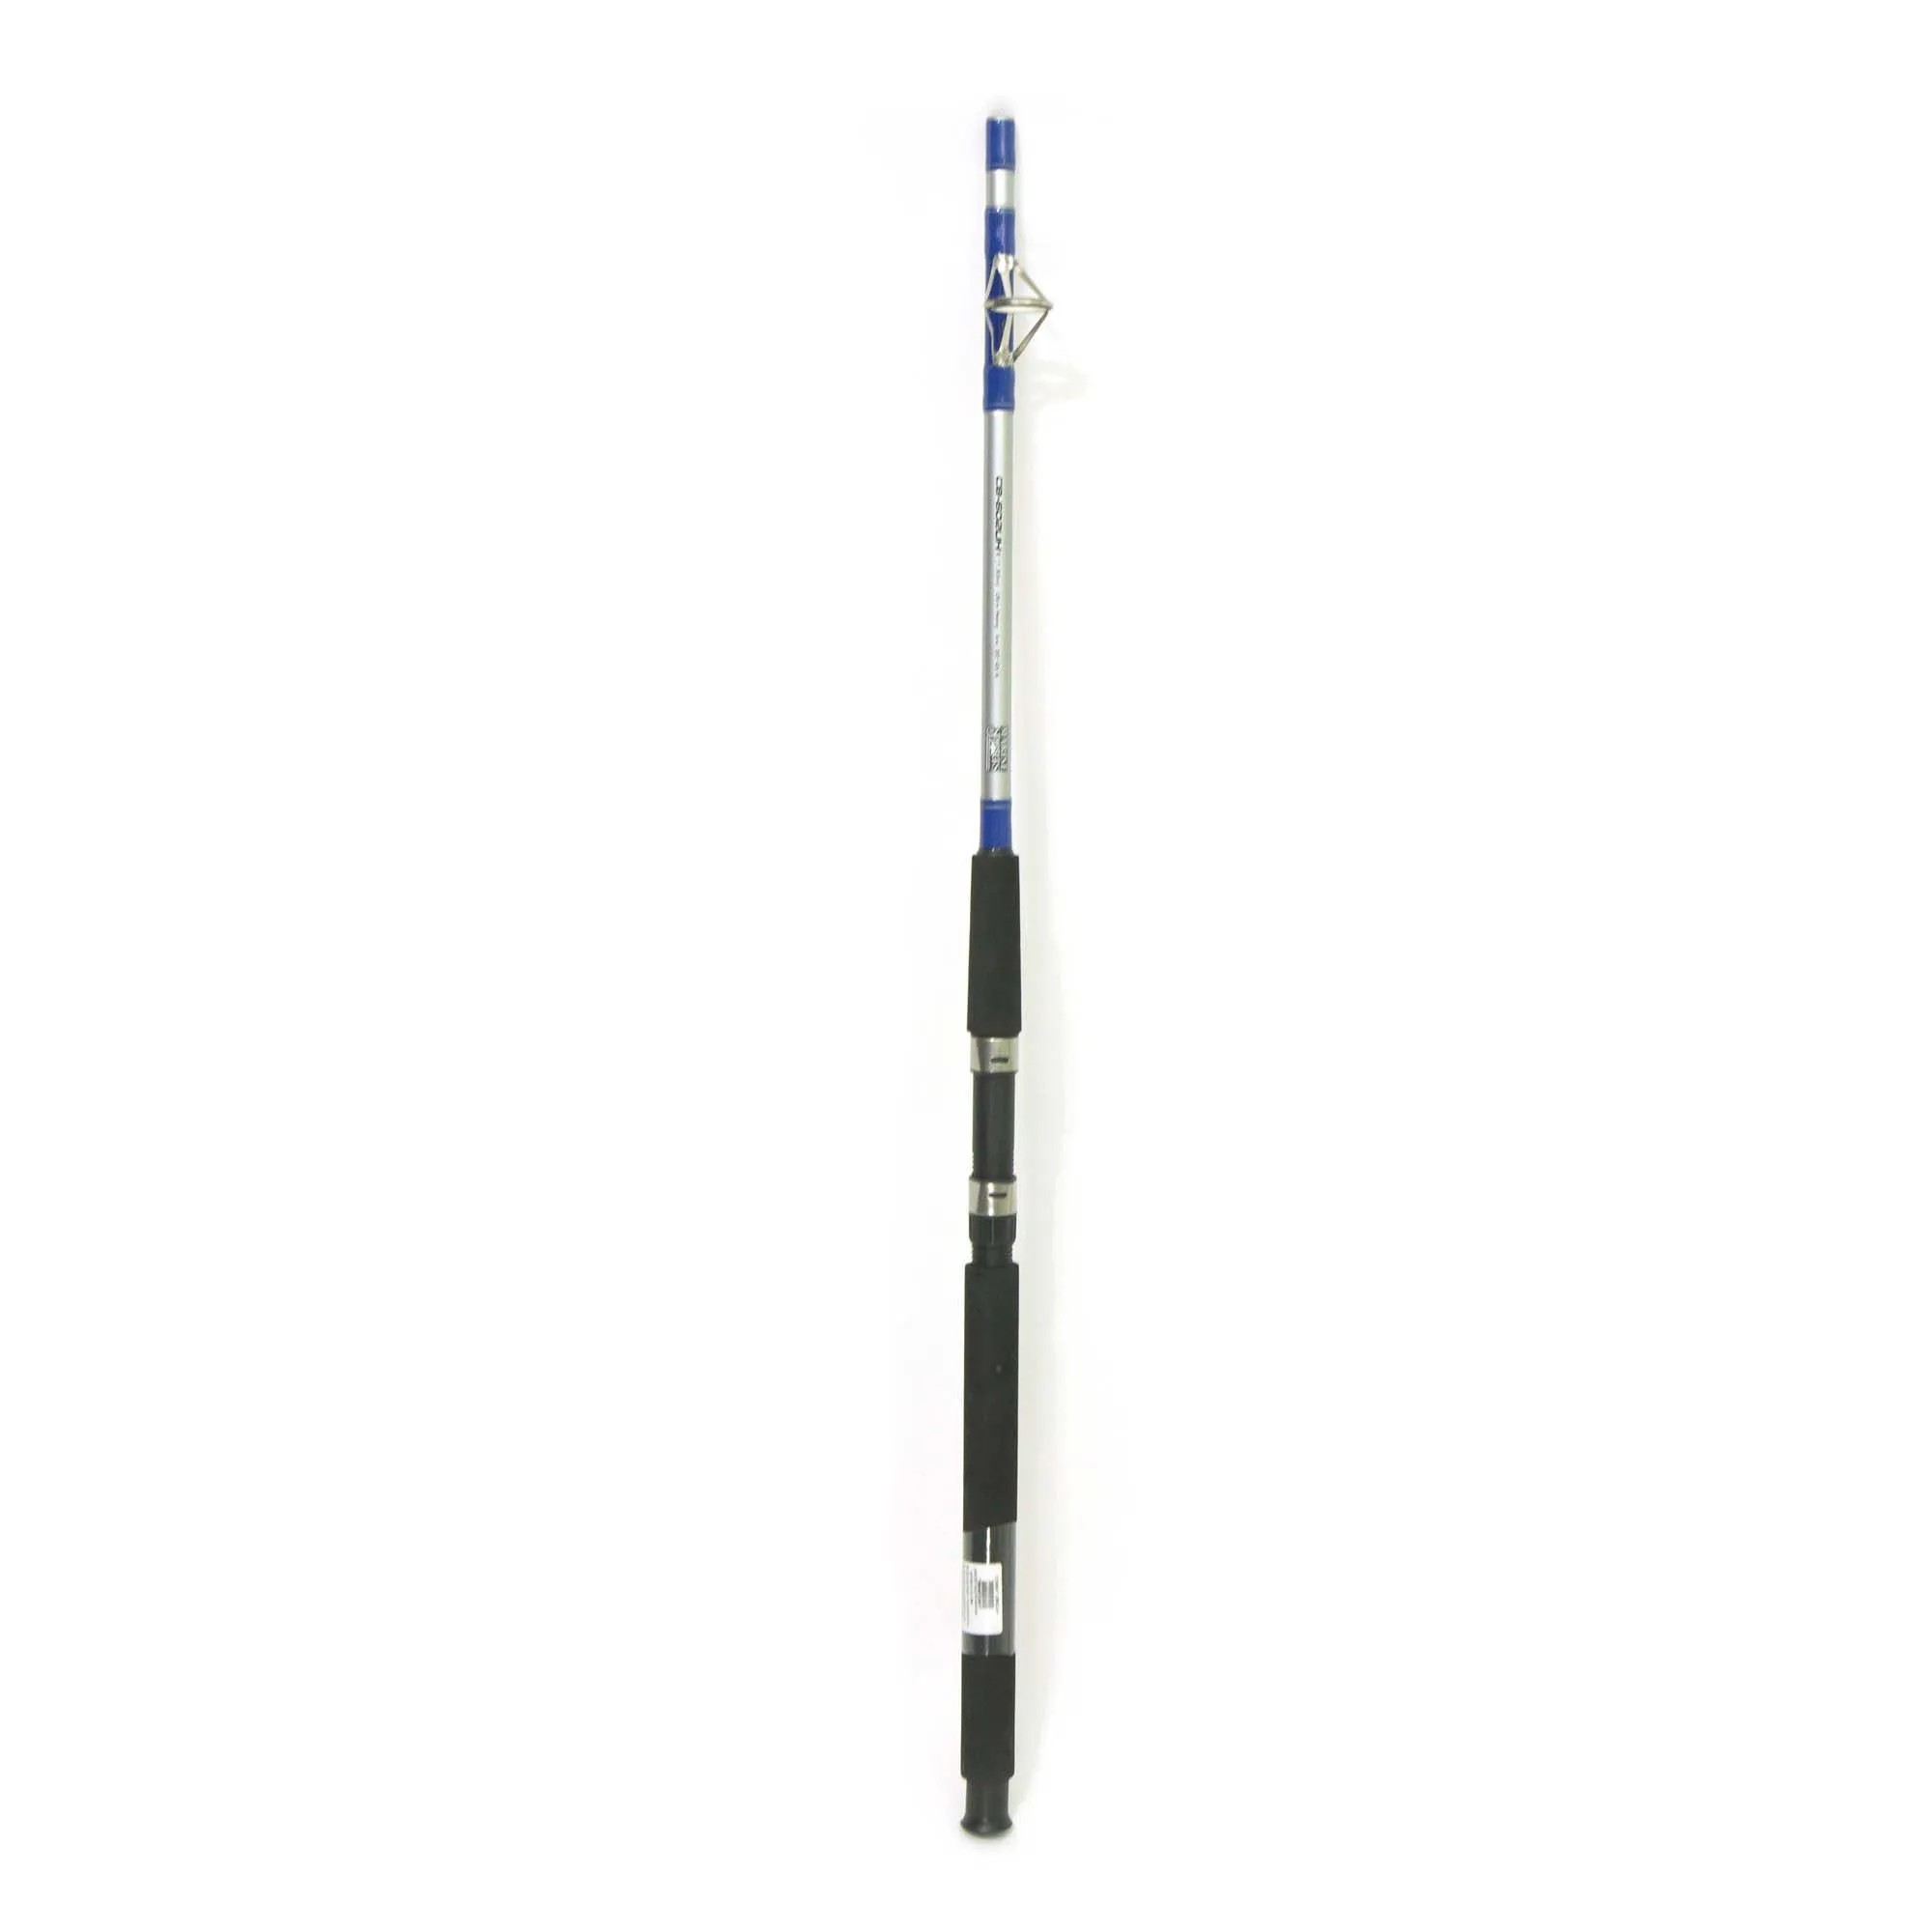 Vara Uso com Molinete Marine Sports COMBAT CB 602UH 1,83m  - Artpesca